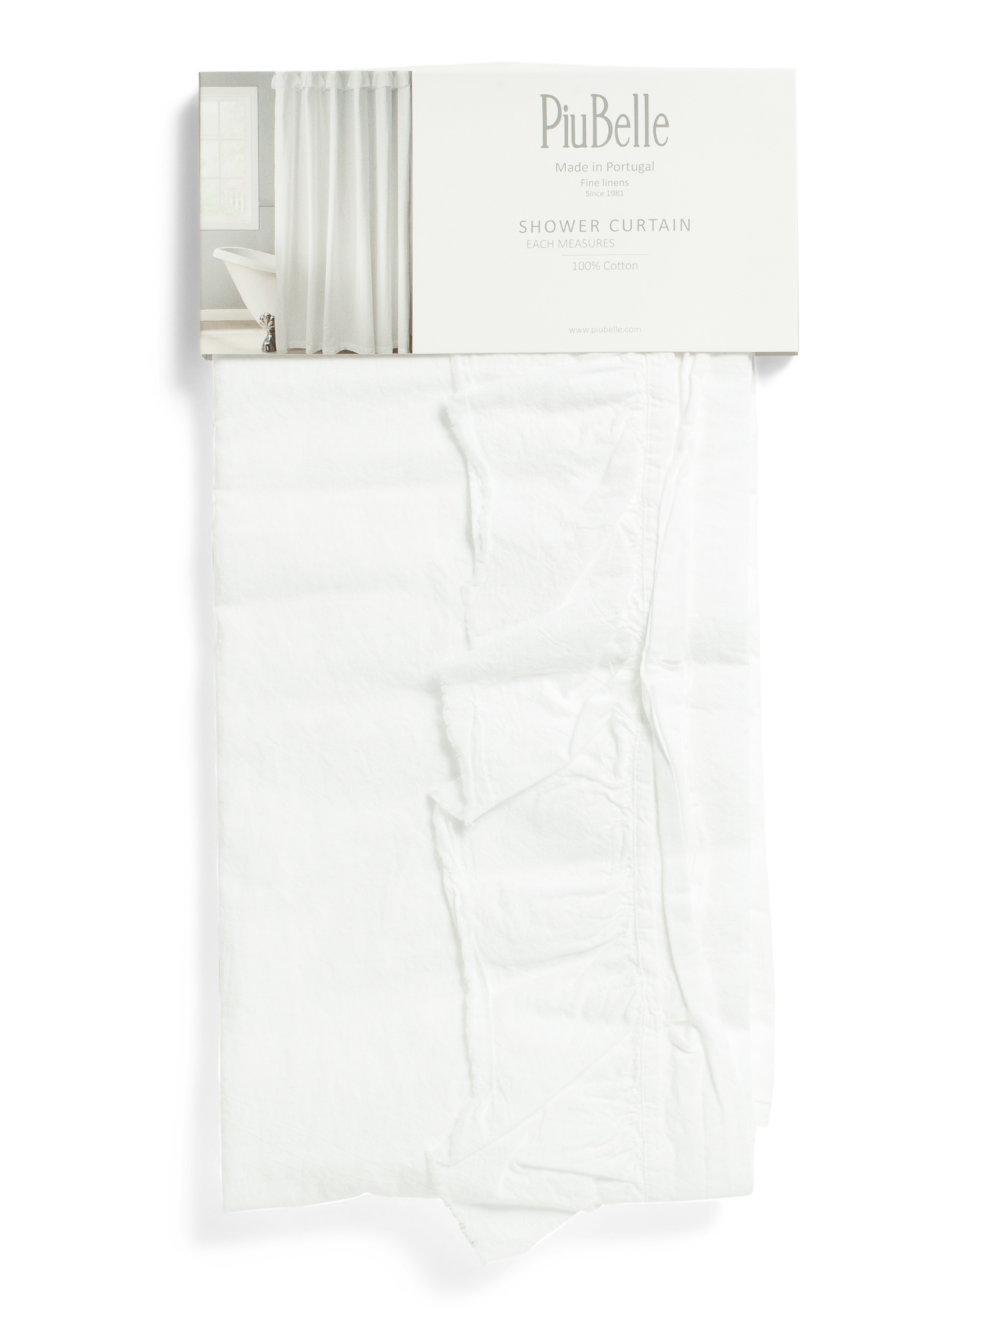 Made In Portugal Ruffle Shower Curtain Bath T J Maxx In 2020